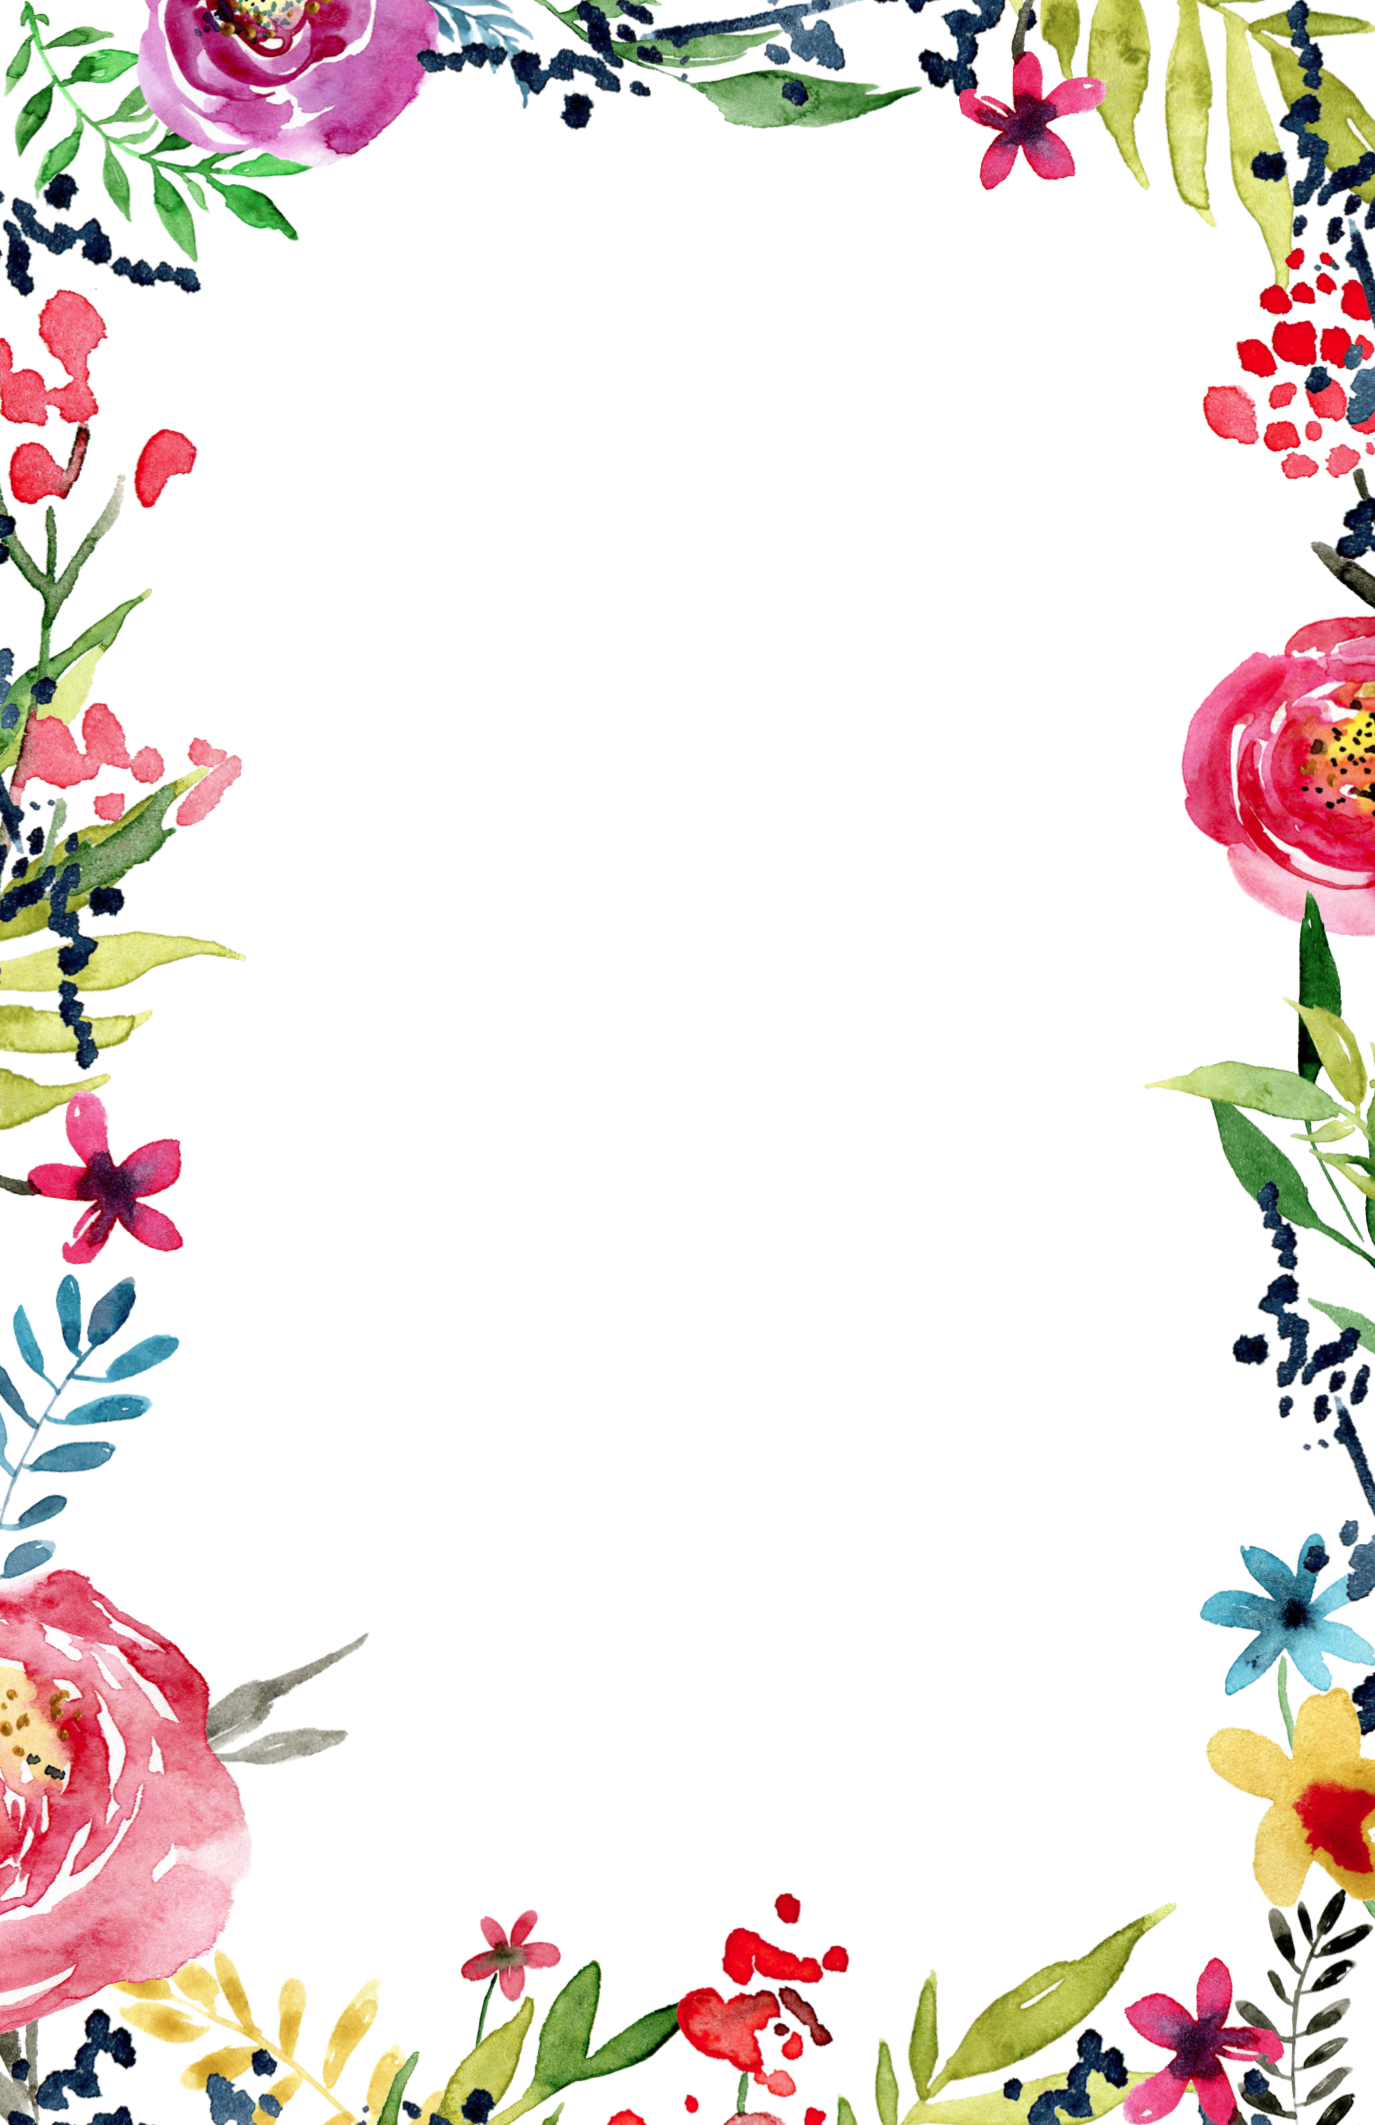 floral borders invitations png 5636 transparentpng